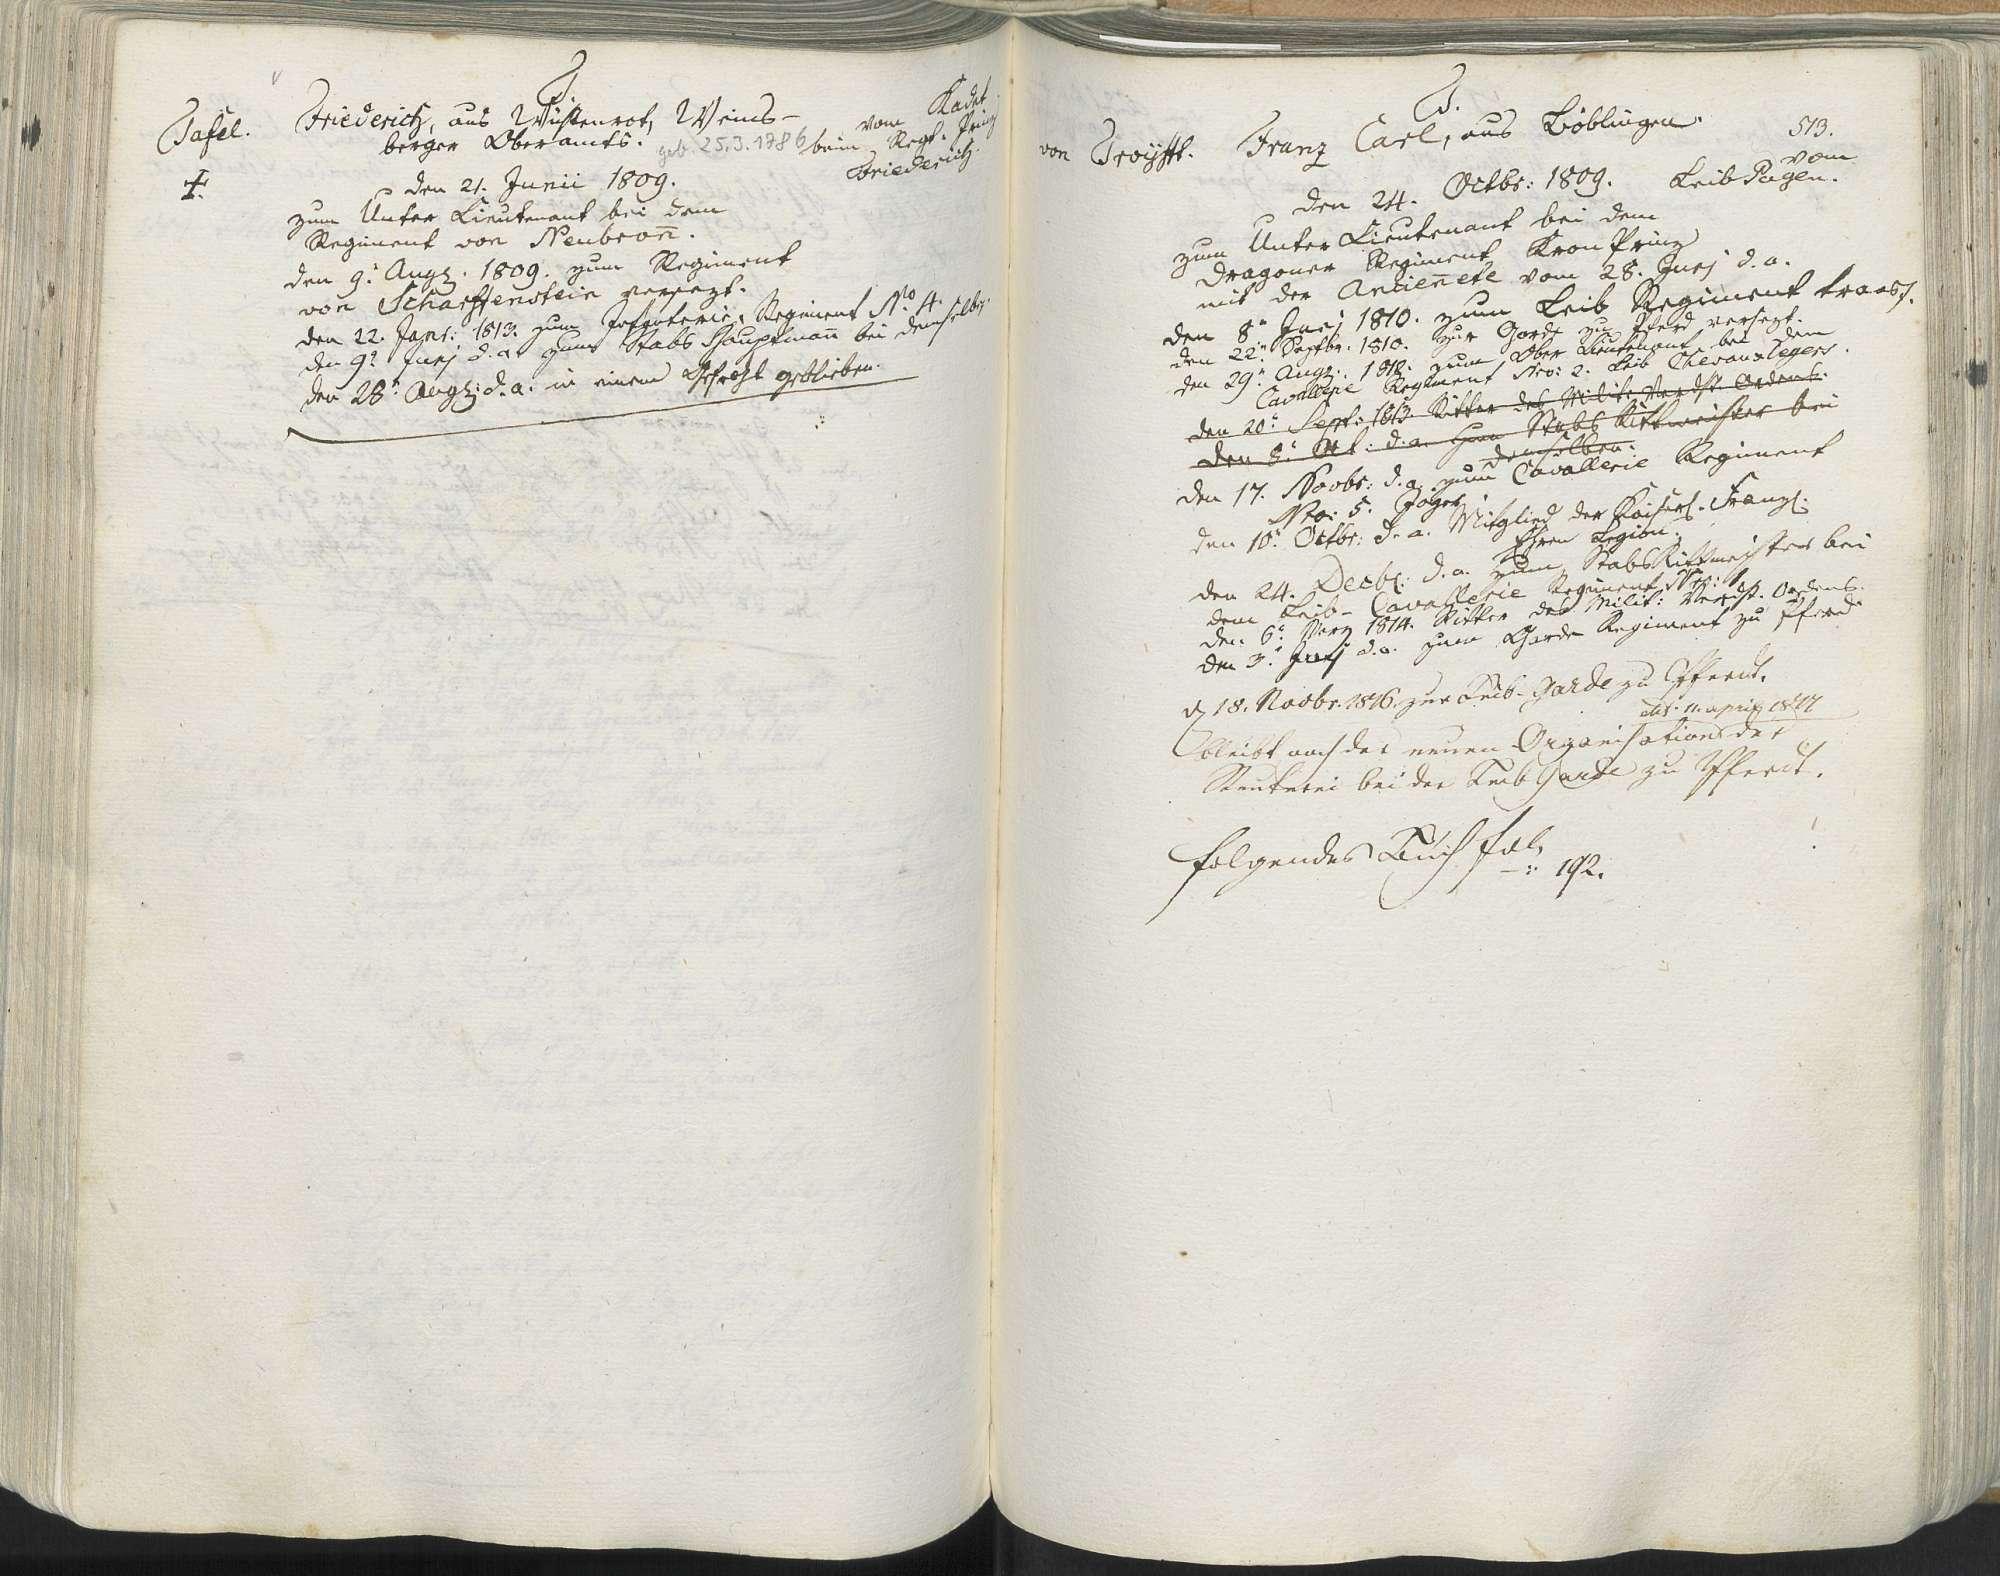 Tafel, Friedrich, Bild 1